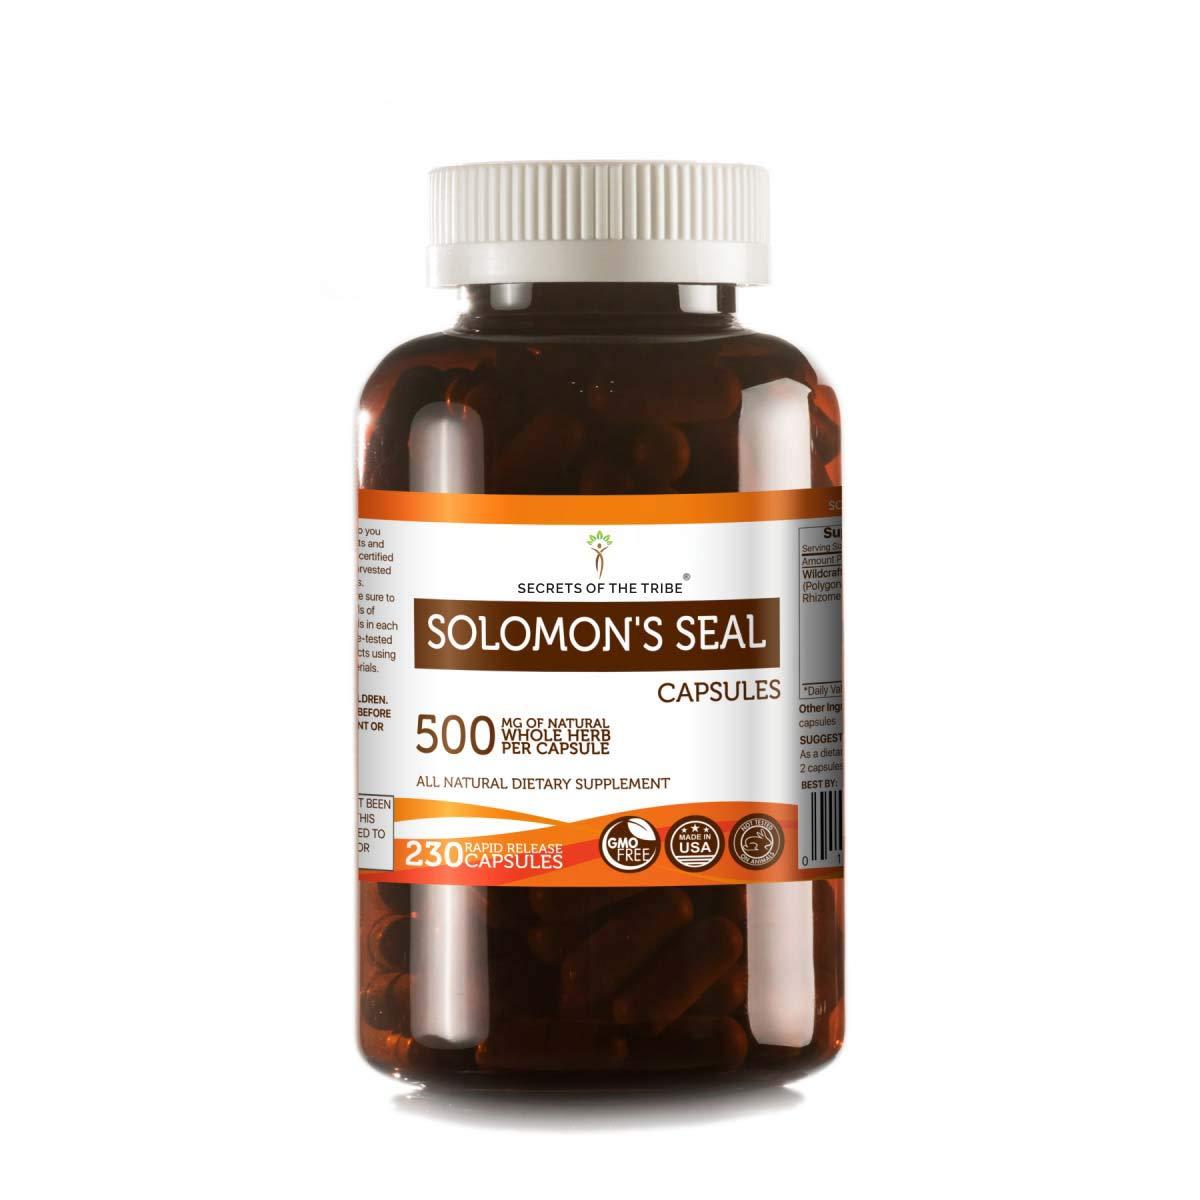 Solomon's Seal 230 Capsules, 500 mg, Wildcrafted Solomon's Seal (Polygonatum odoratum) Dried Rhizome (230 Capsules)